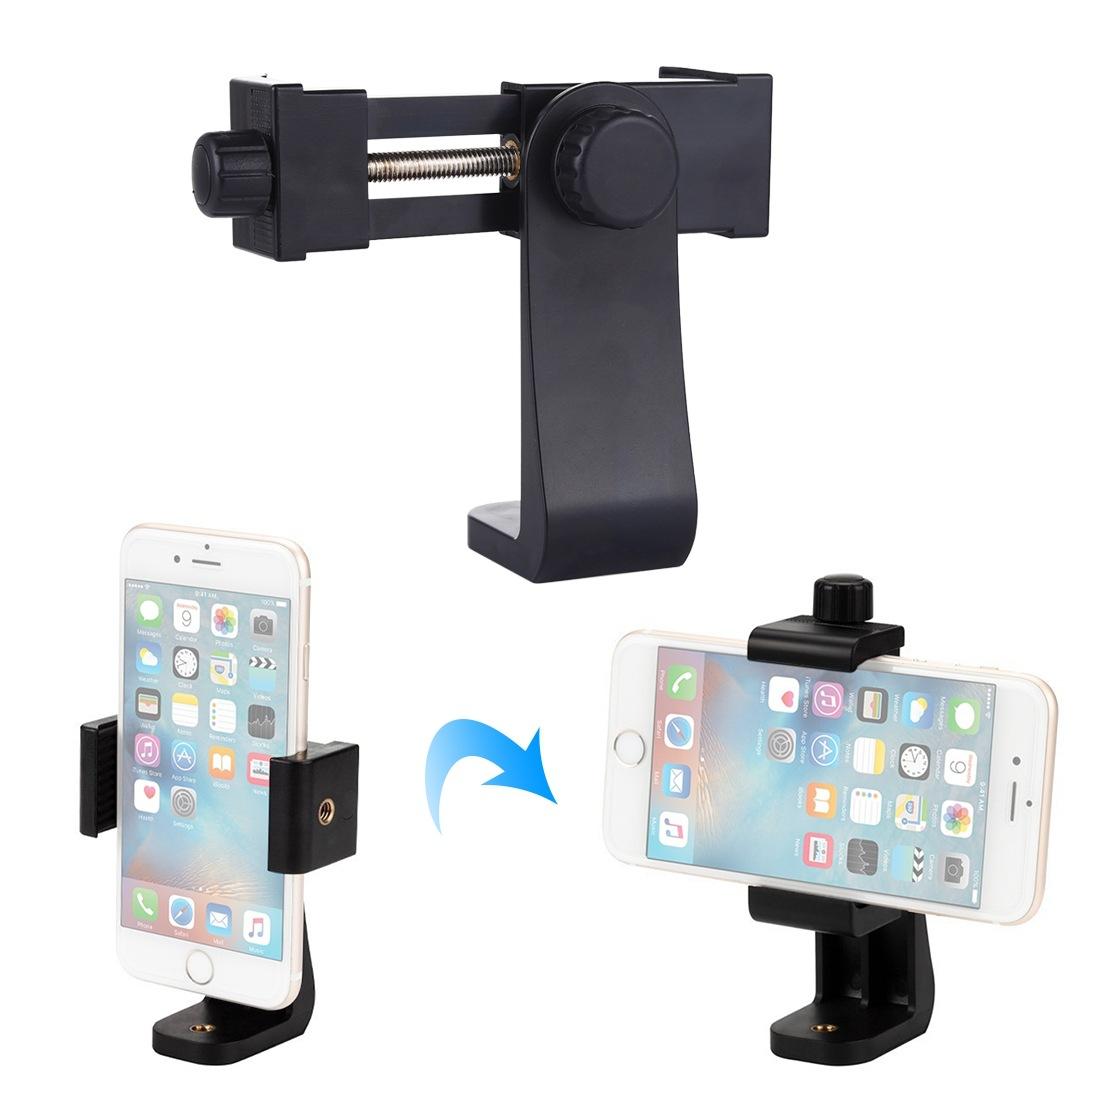 Live Phone Clip Camera Tripod Horizontal Vertical Adjustable Clamp Stable Anti-fall Design black